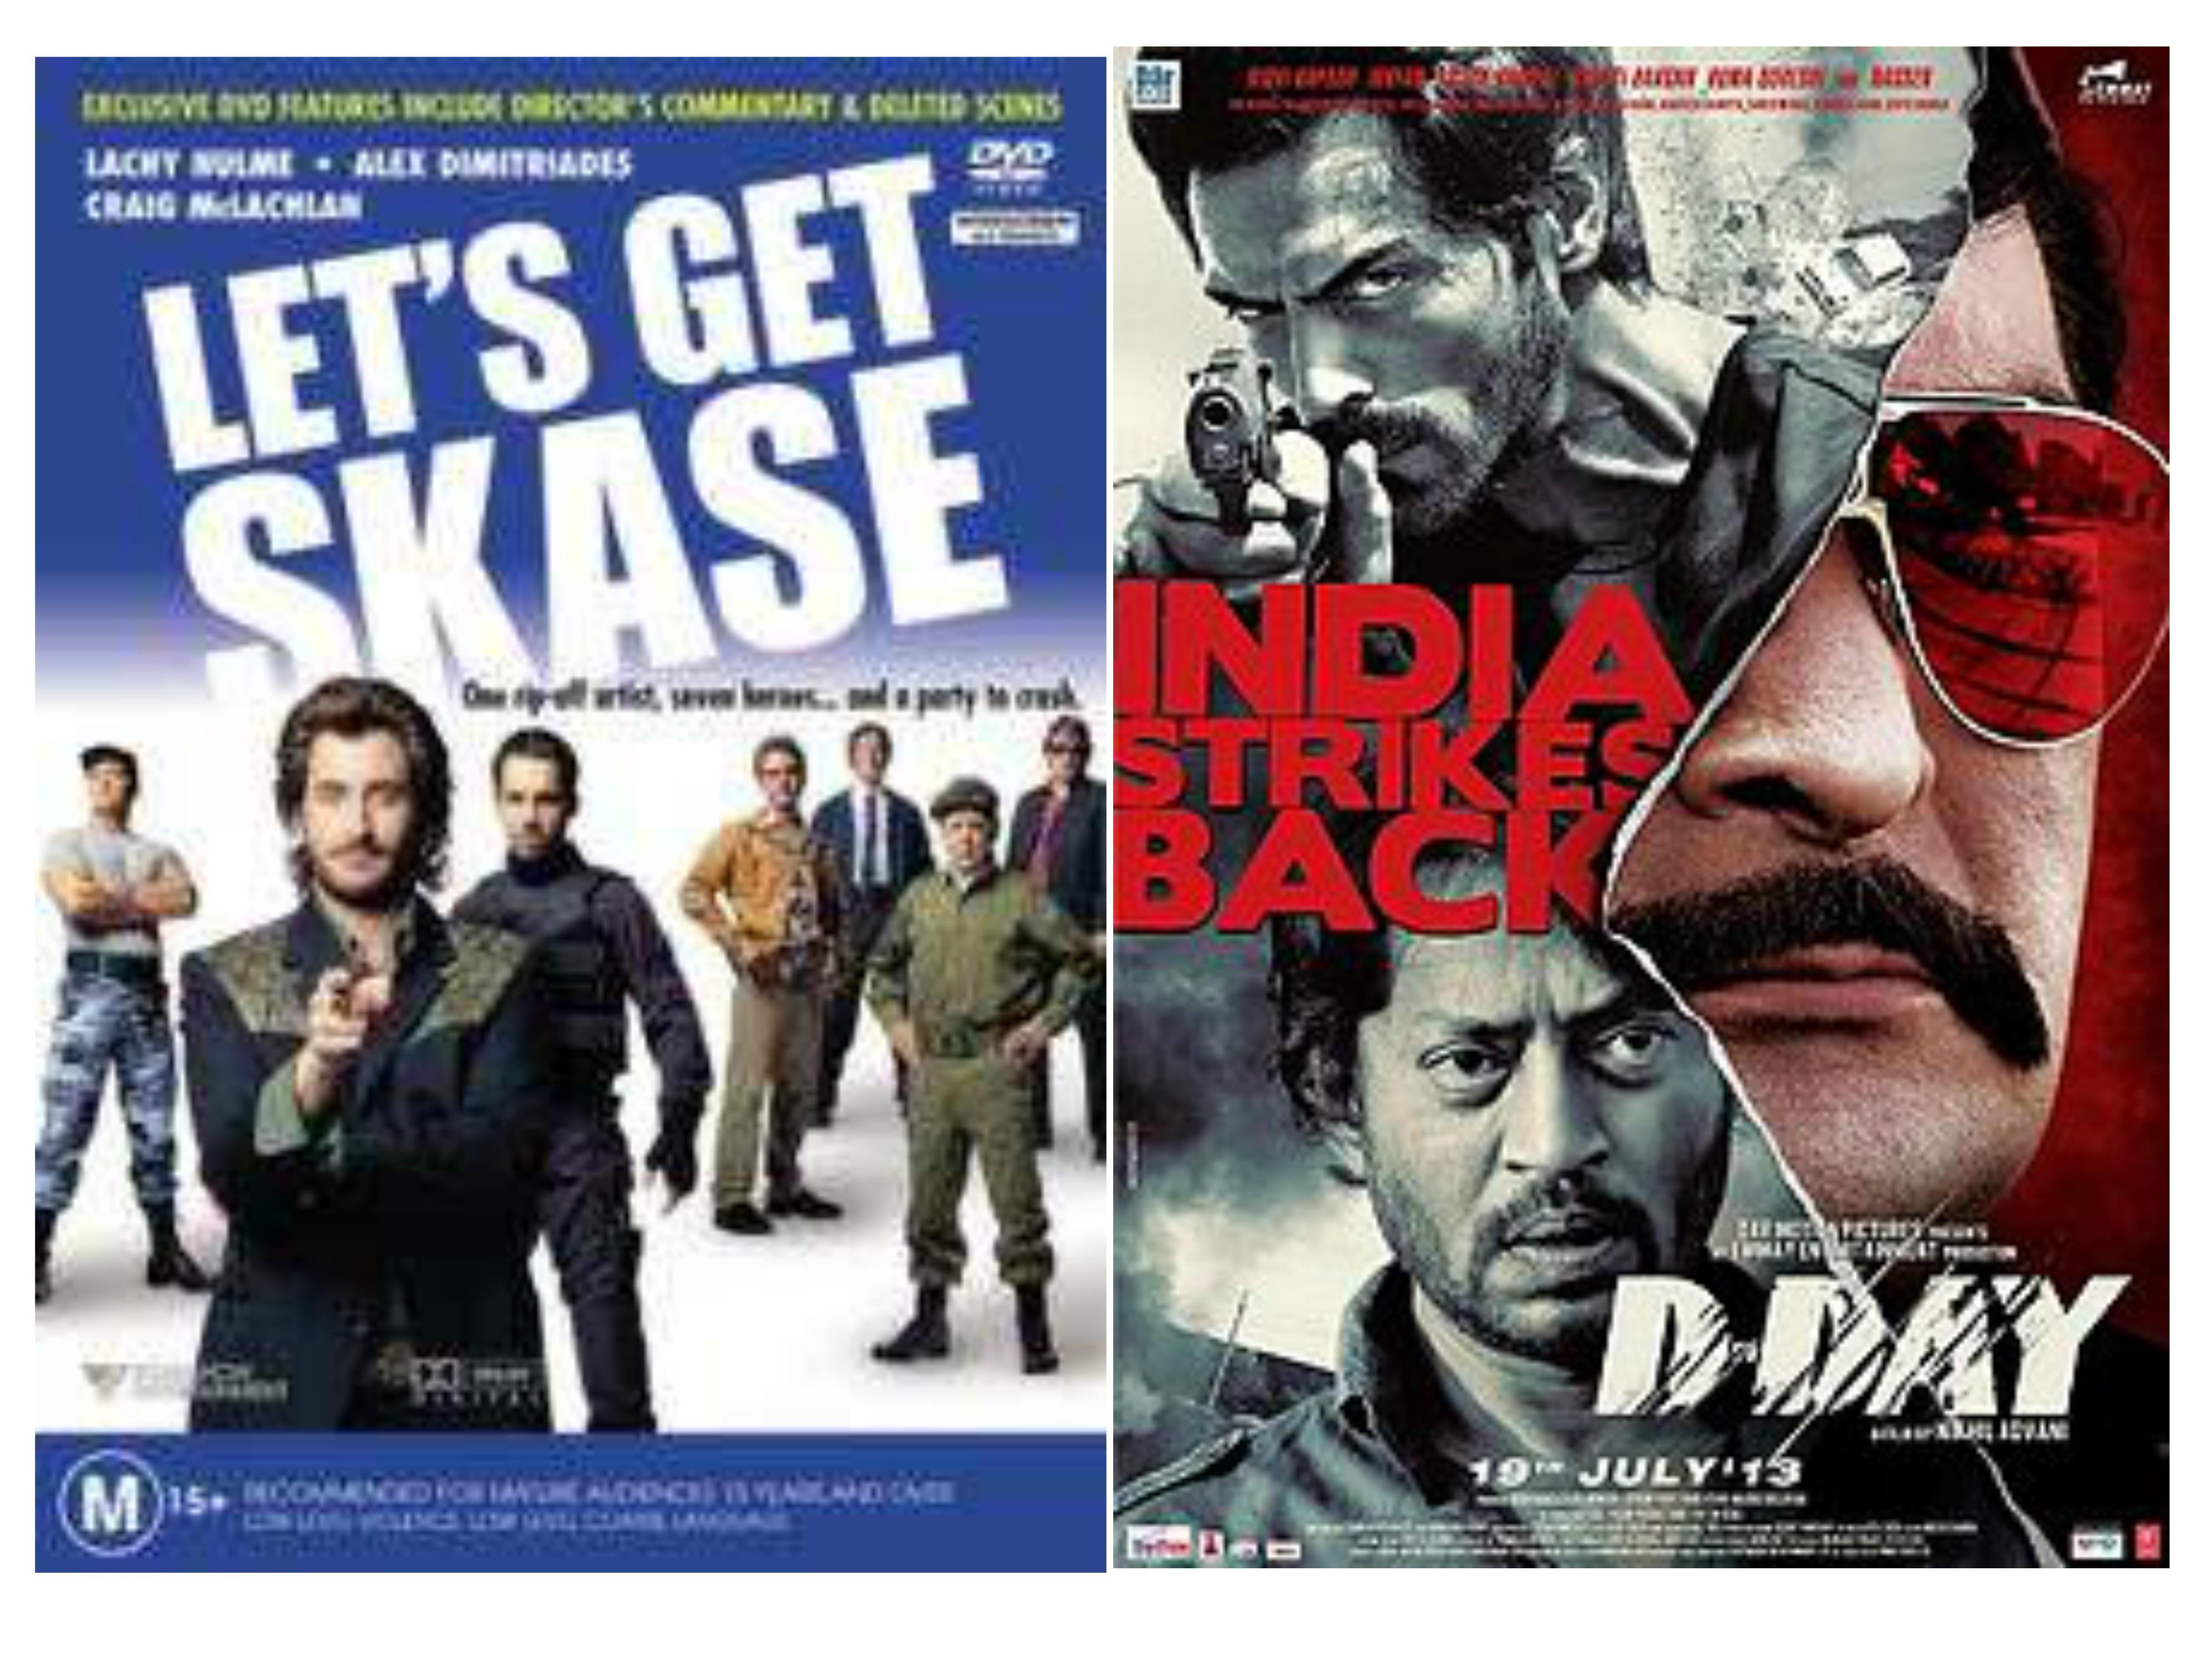 Let's Get Skase (2001) and D-Day (2013)